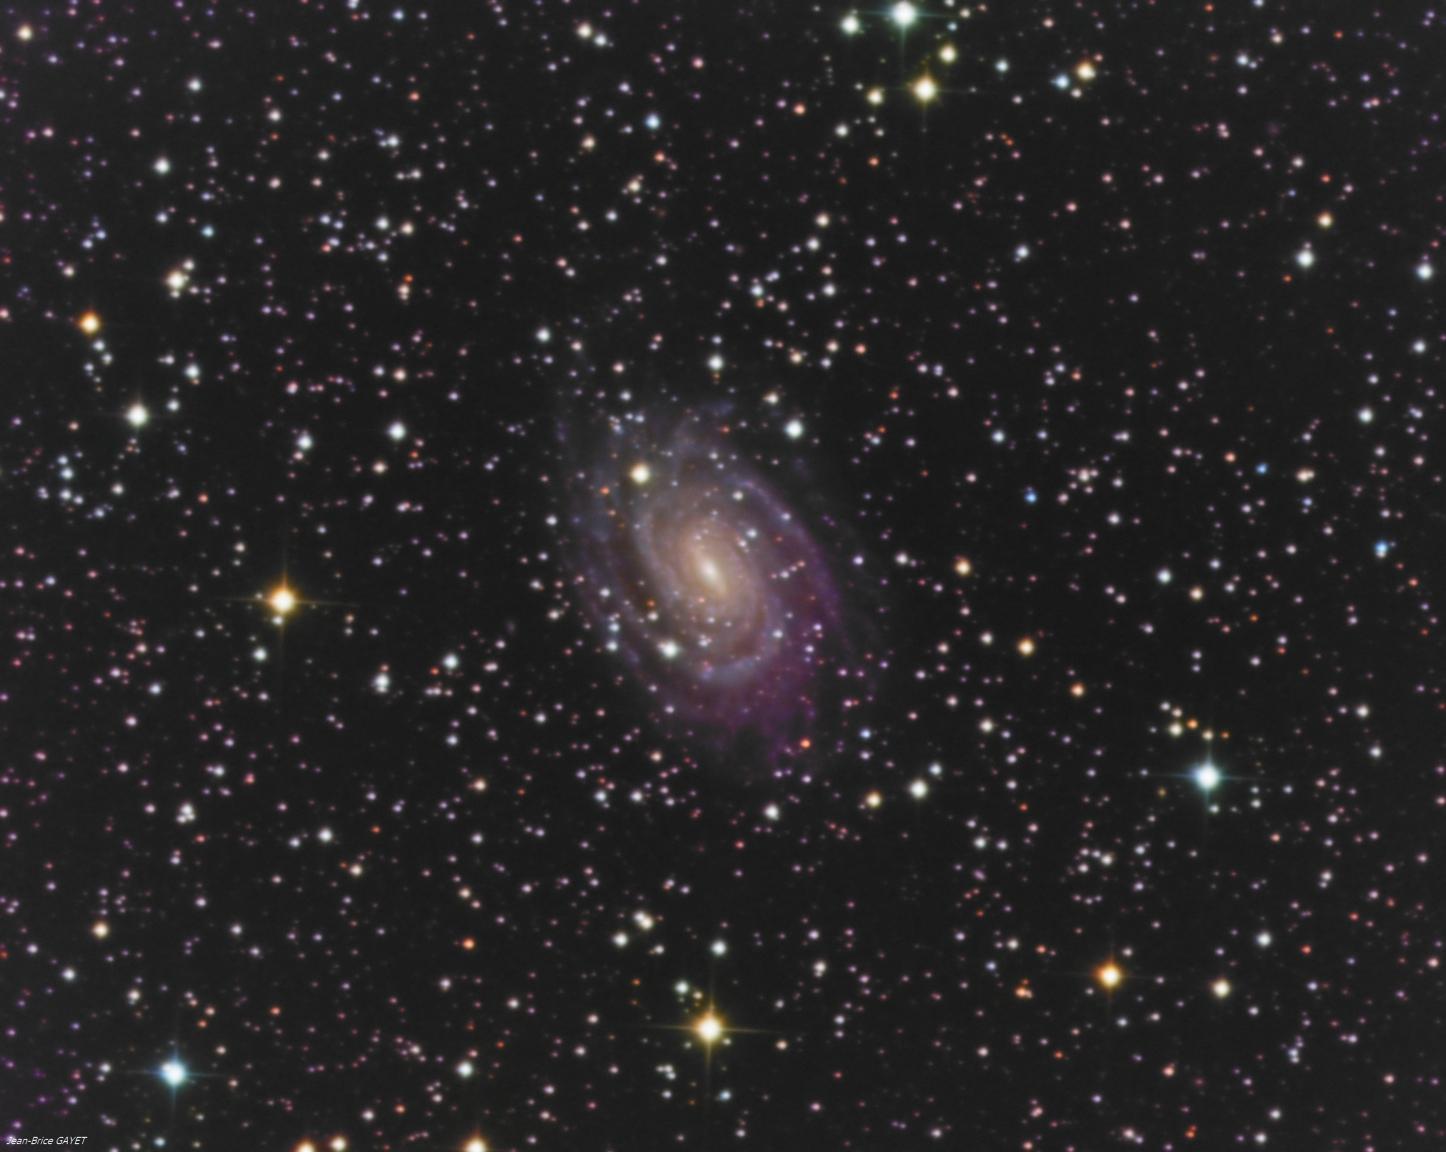 5d3aa6907951e_NGC6384.jpg.22458b46603b63163a6dfd47946846e6.jpg